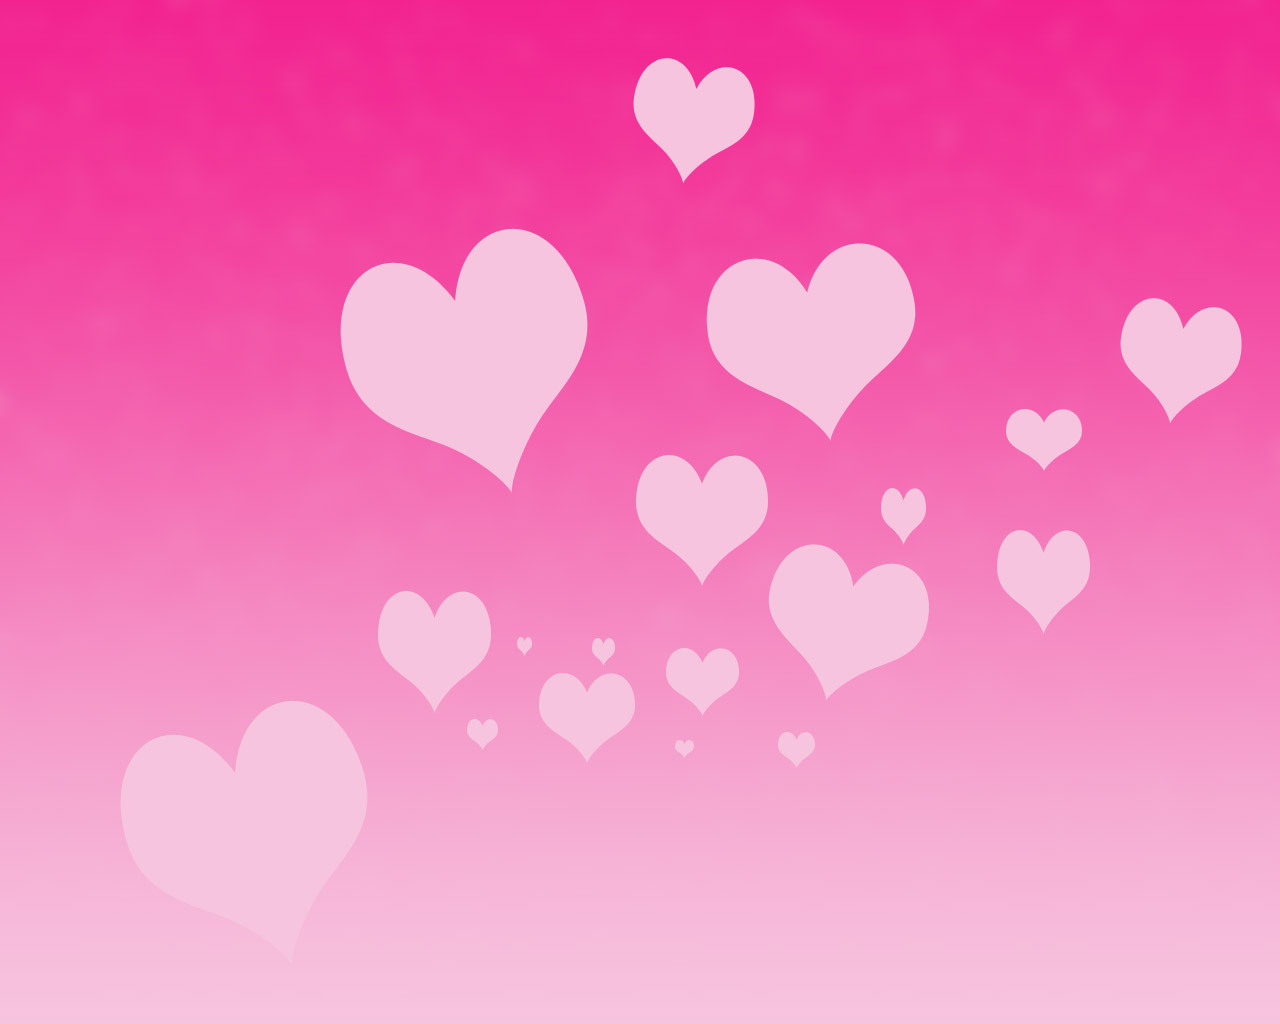 pink color pink wallpaper pink color pink wallpaper pink color pink 1280x1024